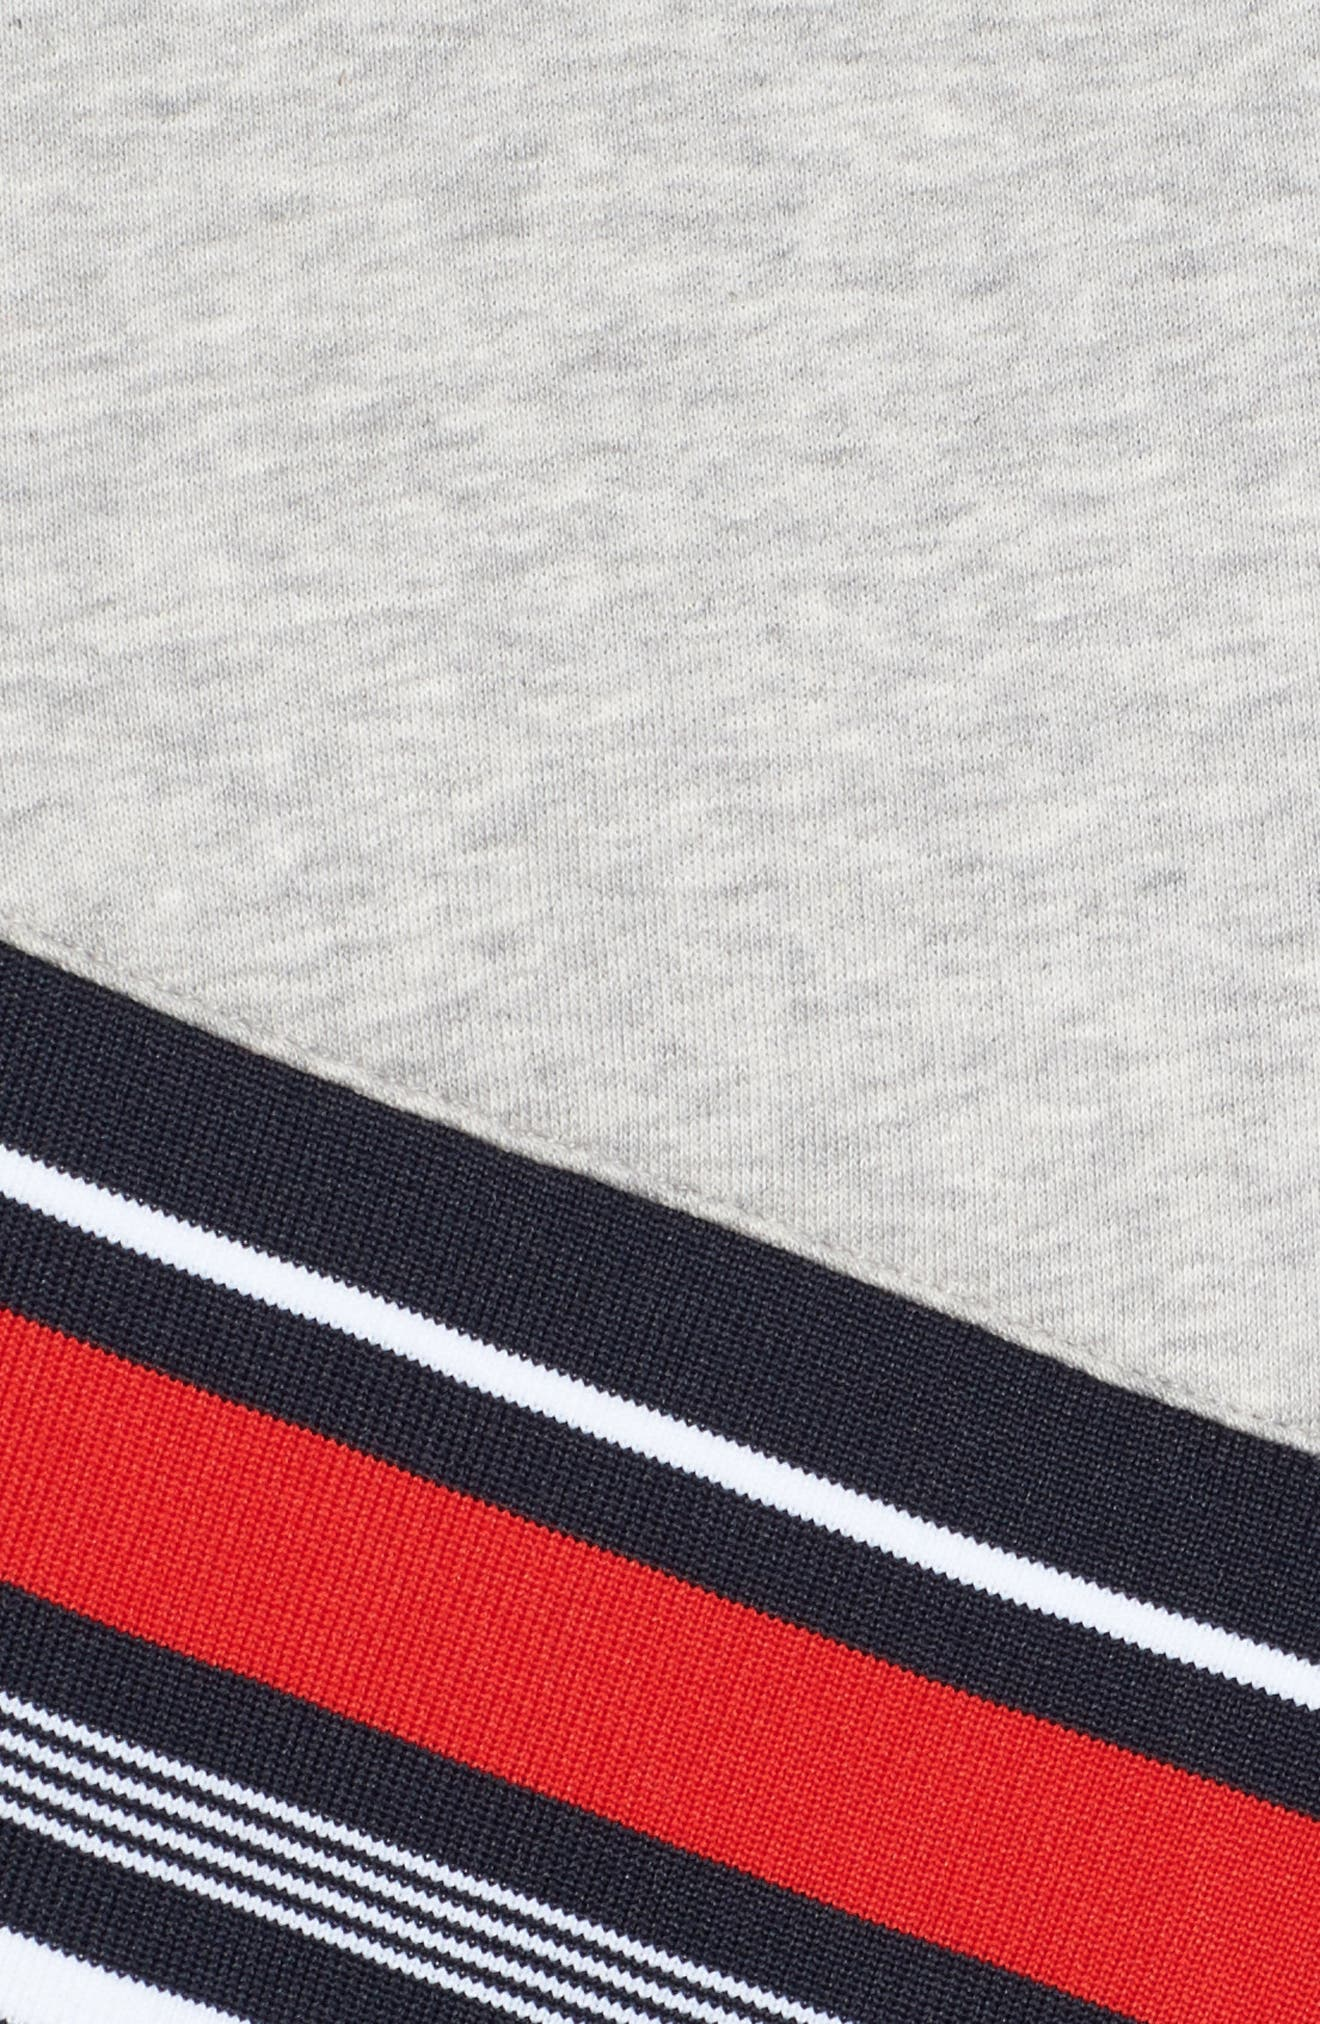 x Gigi Hadid Racing Sweatshirt Dress,                             Alternate thumbnail 5, color,                             405